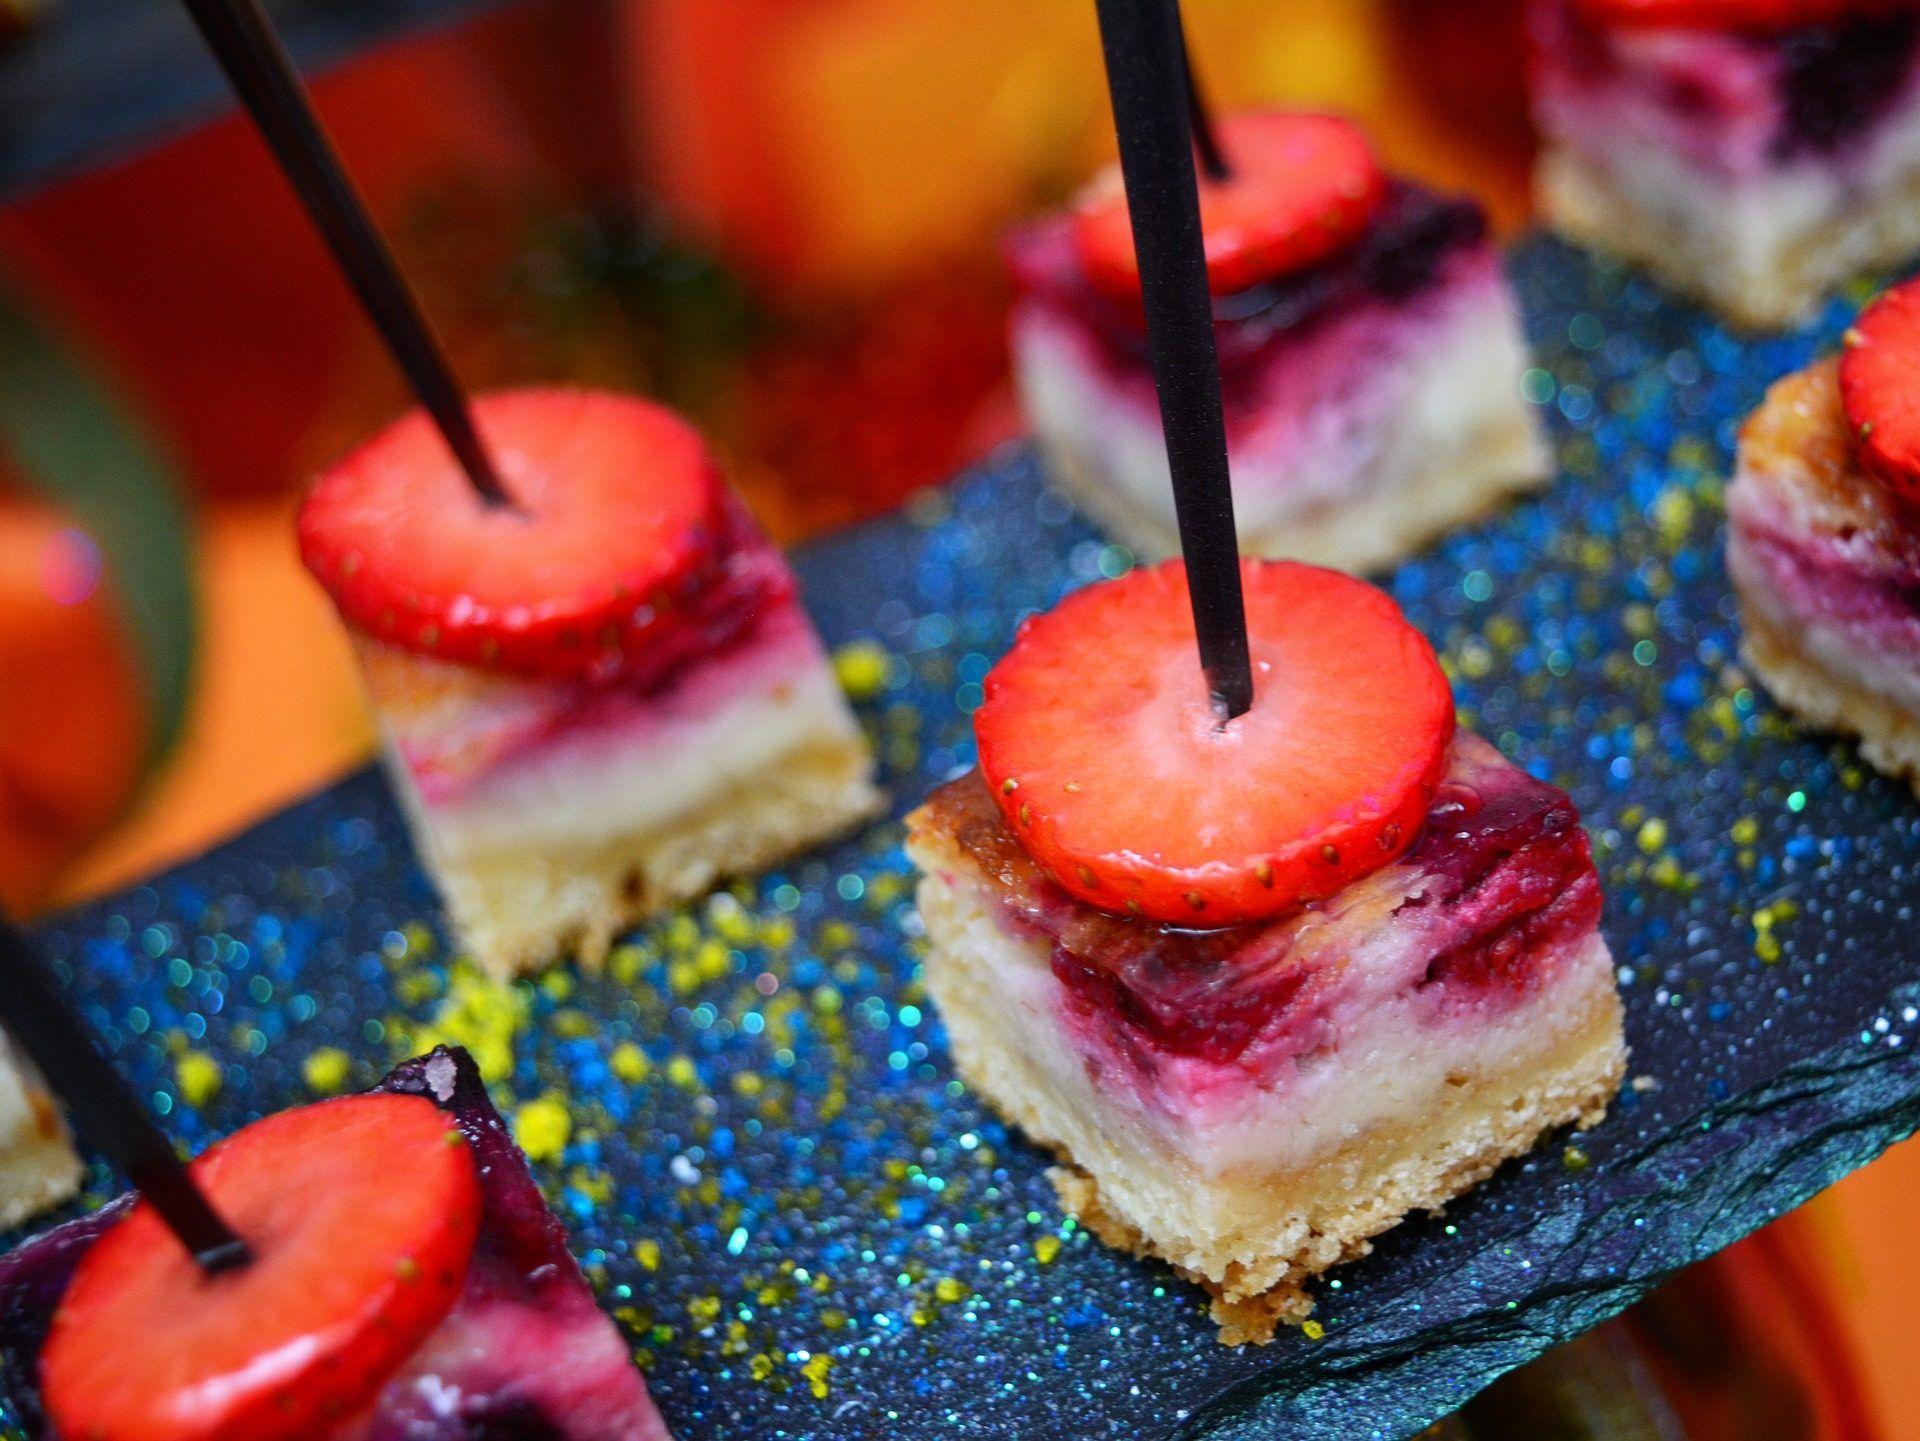 pincho, porción, tarta, fresa, pastel, postre, 1704112336